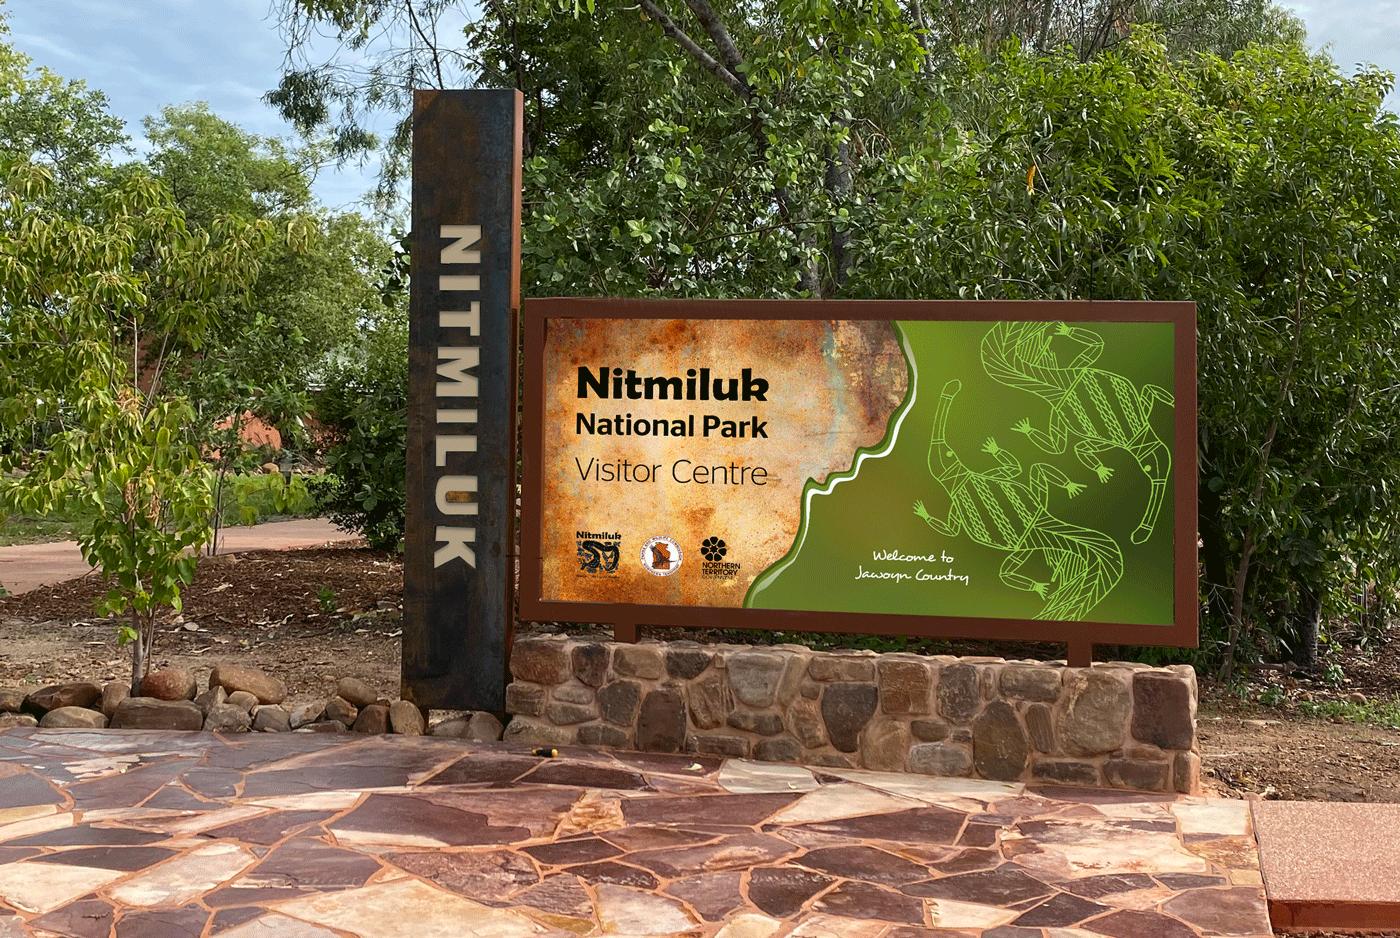 Nitmiluk Entry Statement